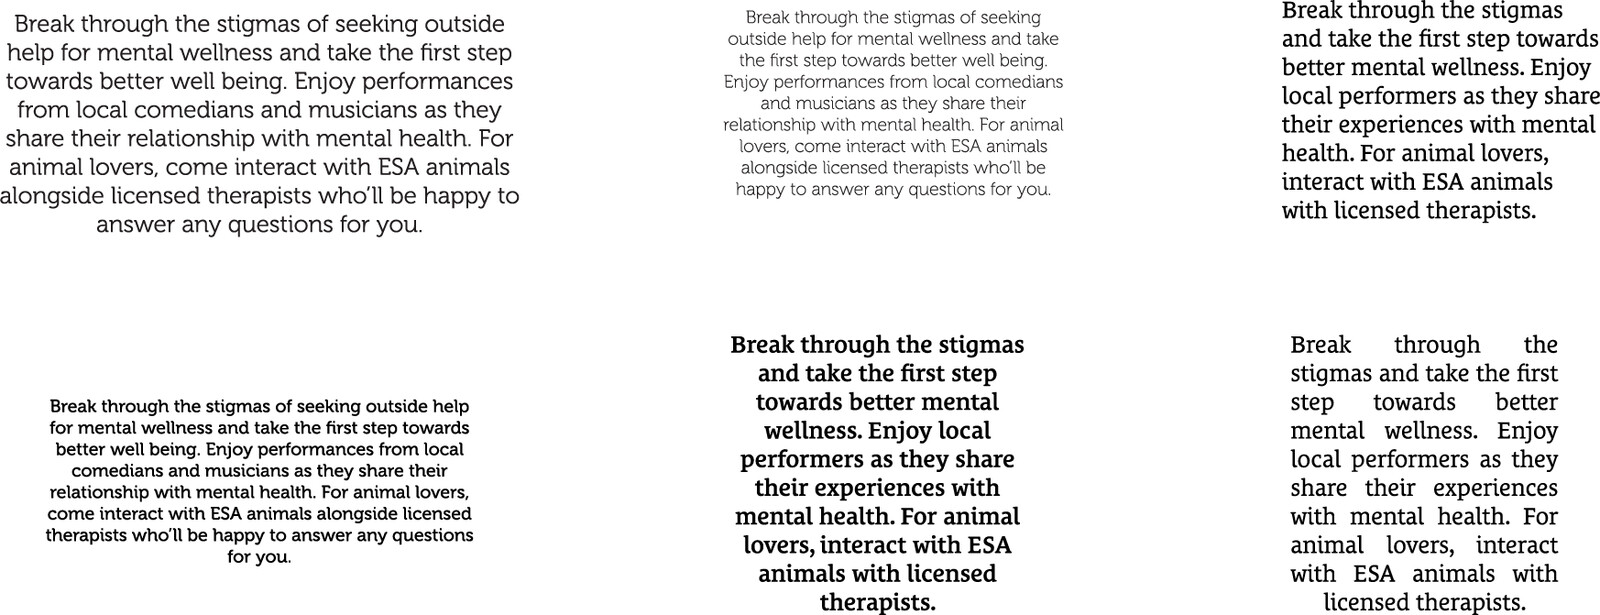 Paragraph Study